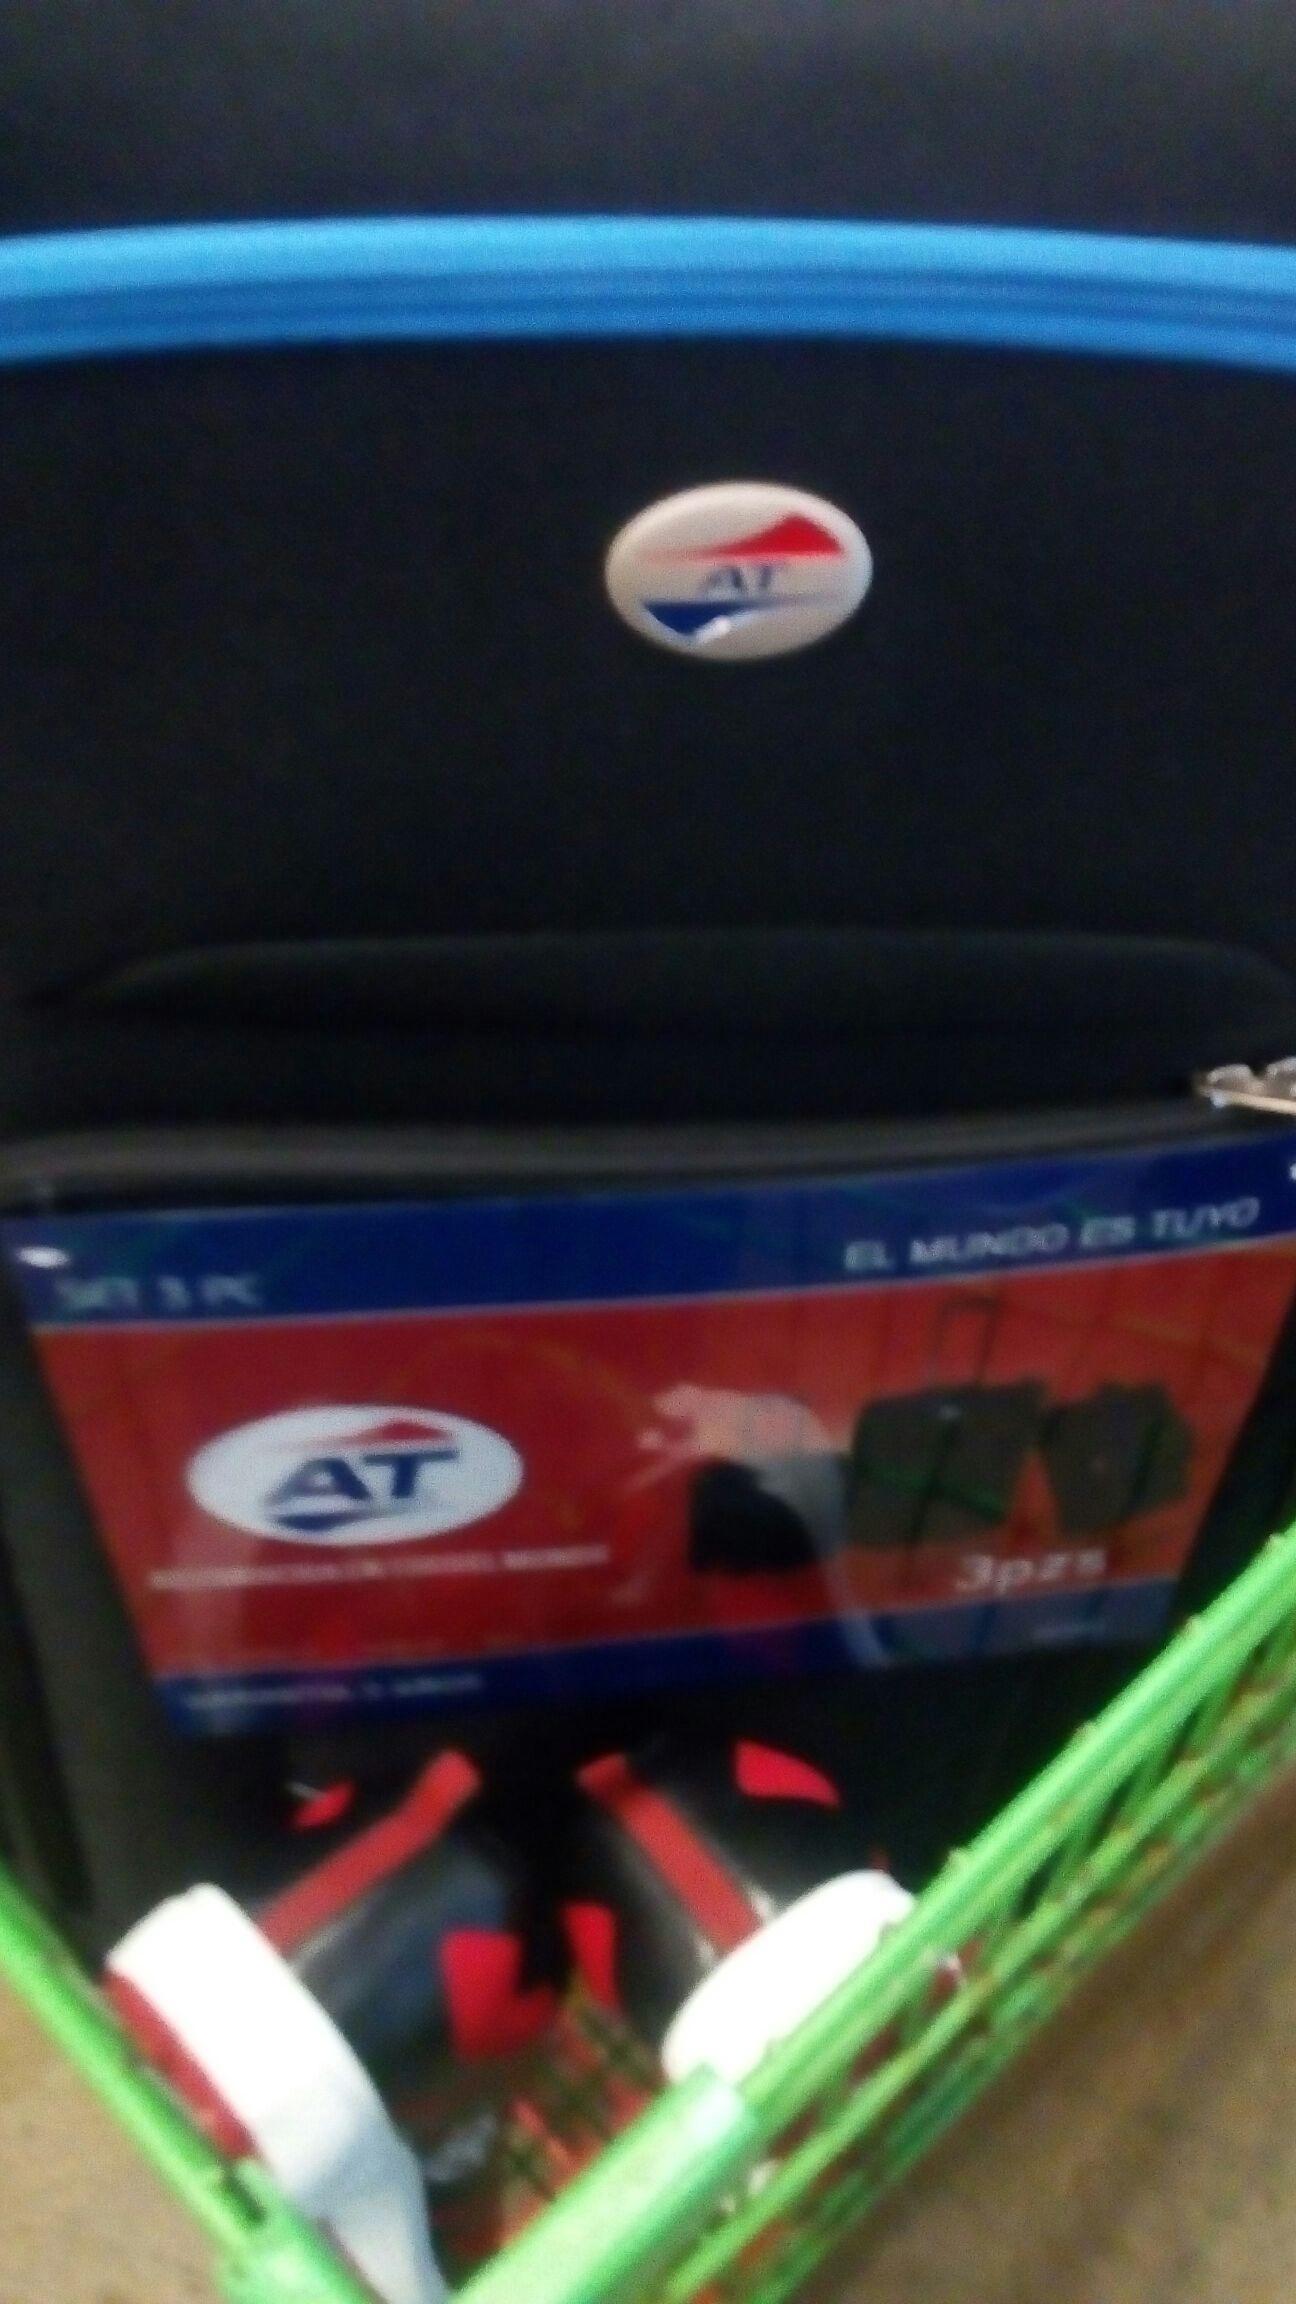 Bodega Aurrerá: set de 3 maletas en $283.01 tenis en $30.01 barra para cortina en 42.01